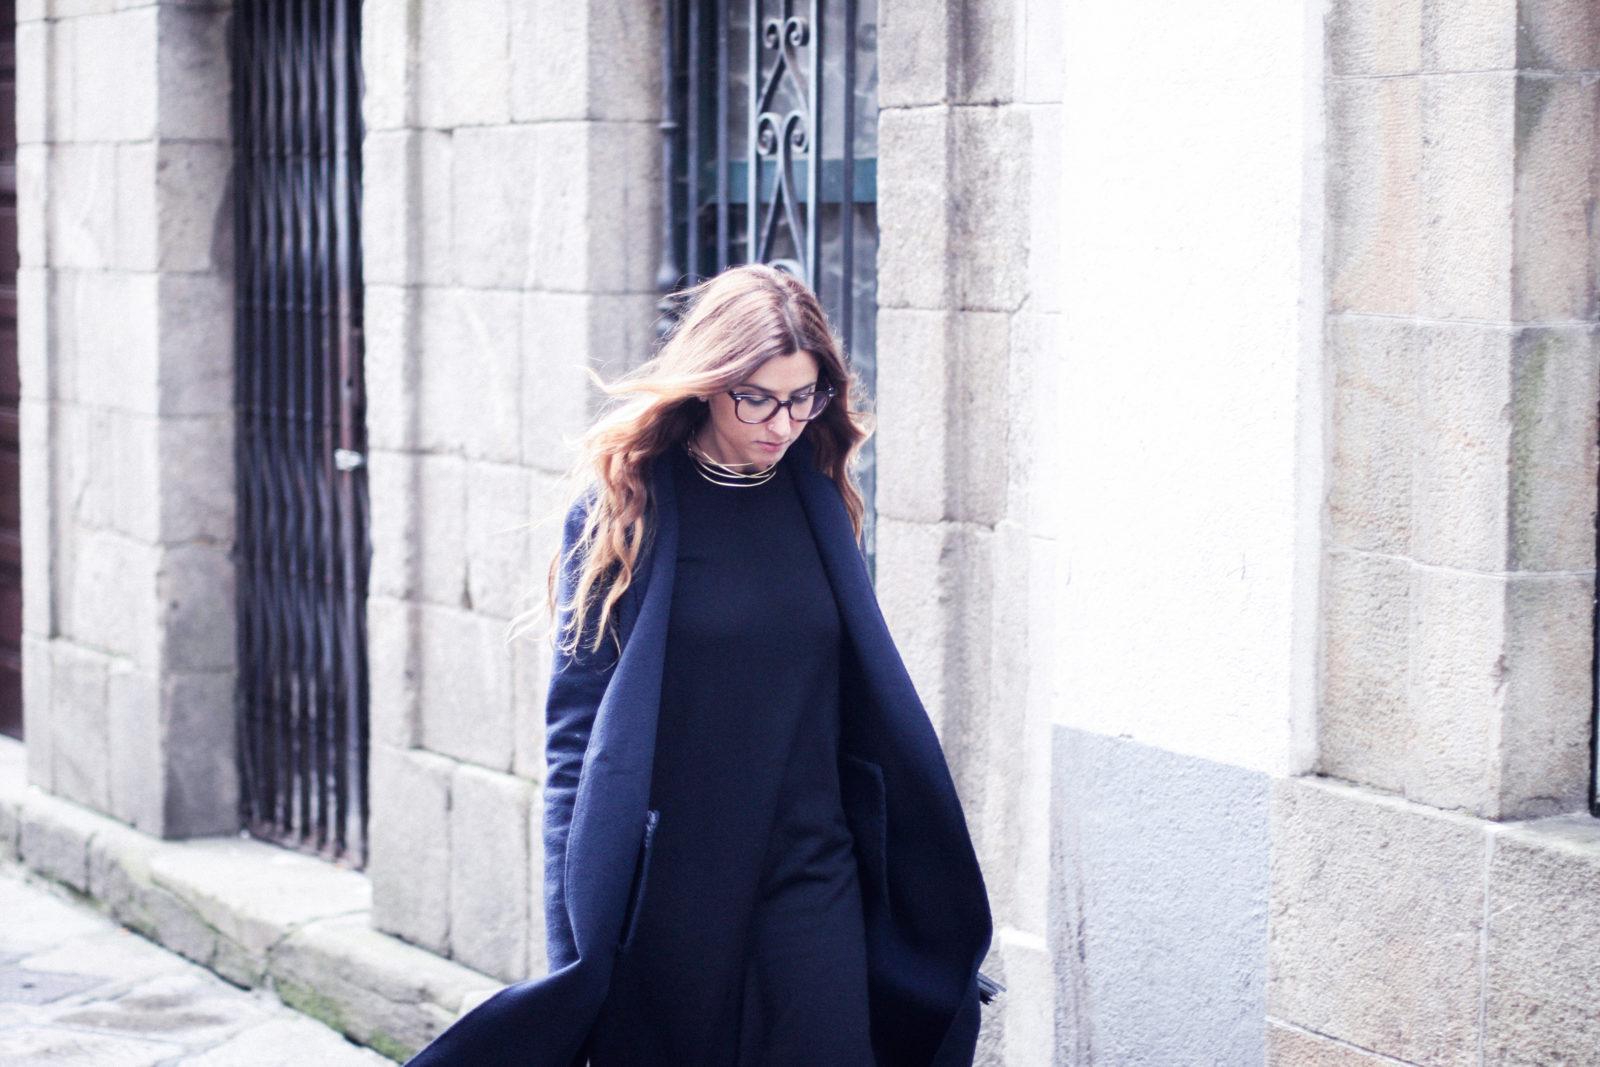 vestido_de_punto_midi_vans_calcetines_rejilla_choker_metalico_happiness_boutique_abrigo_largo_gucci_street_style_fall_2016_donkeycool-17